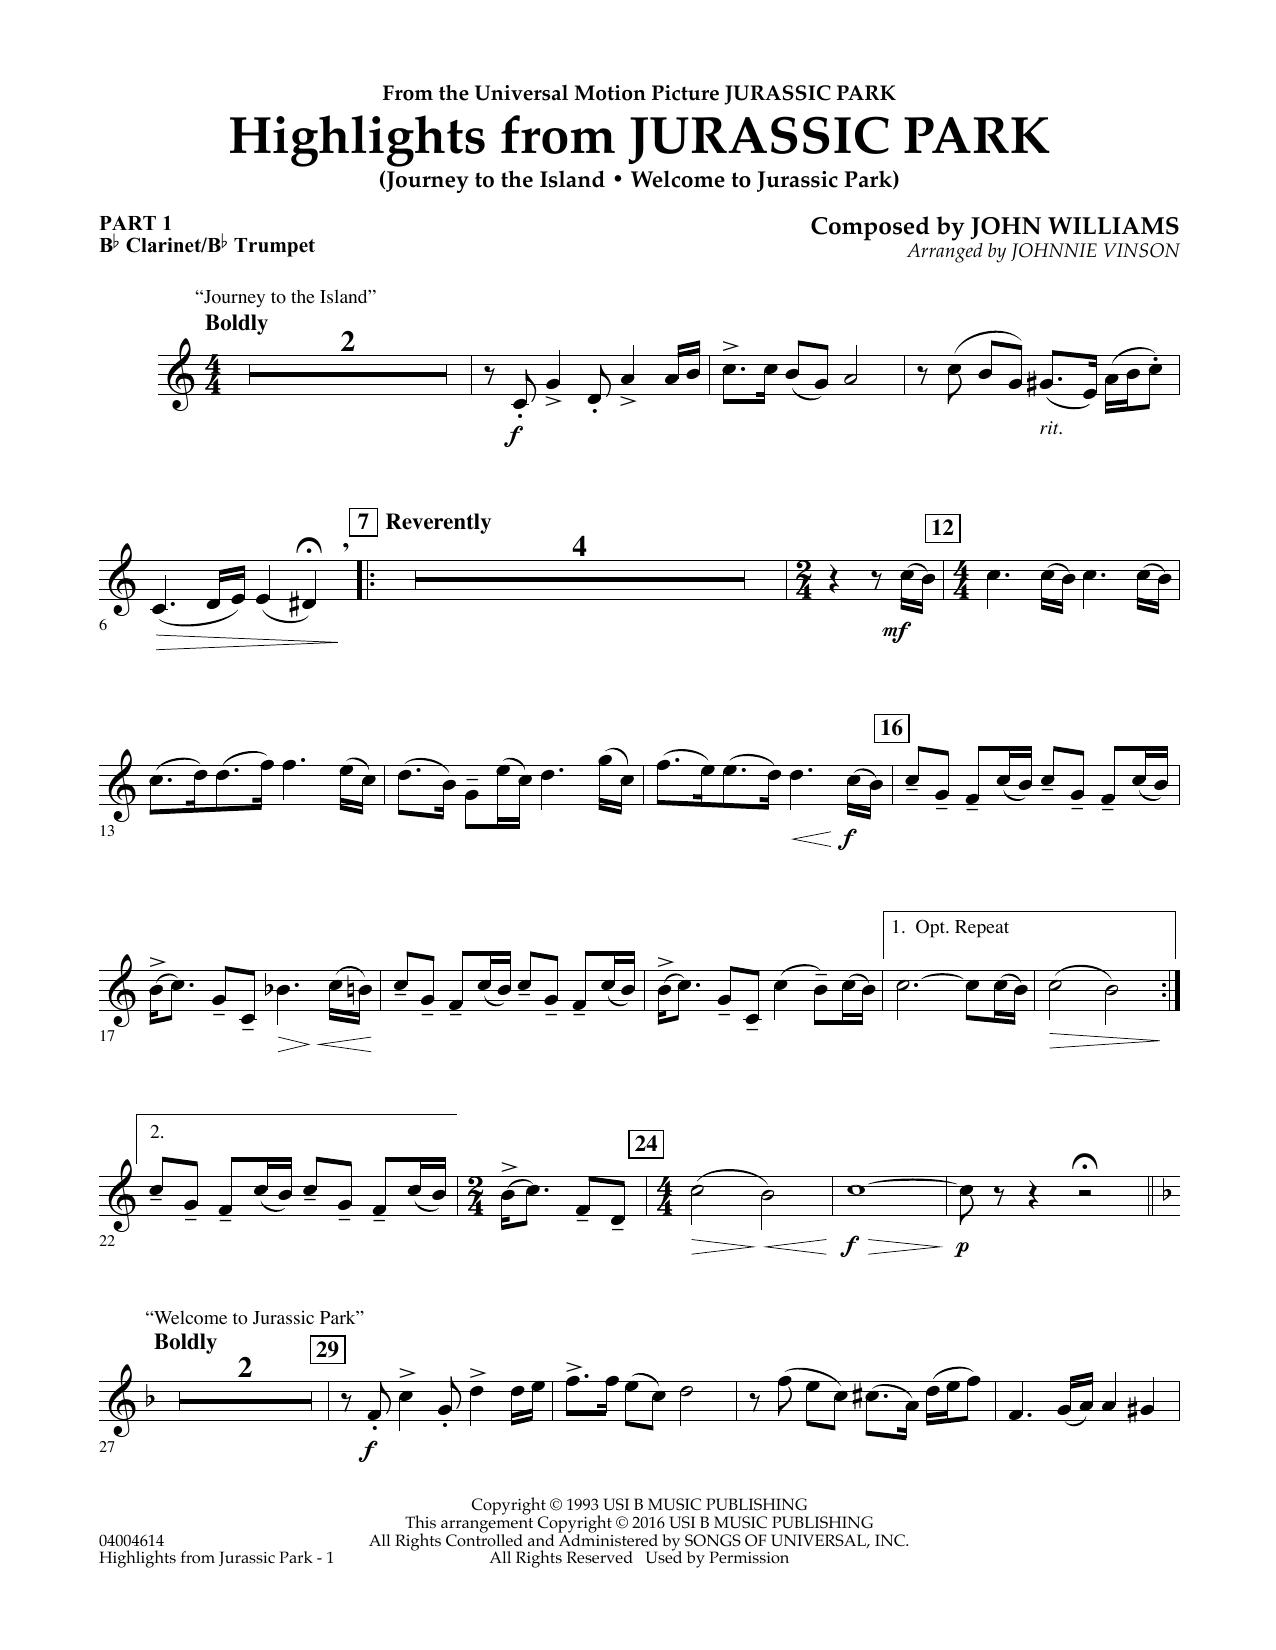 jurassic park sheet music trumpet